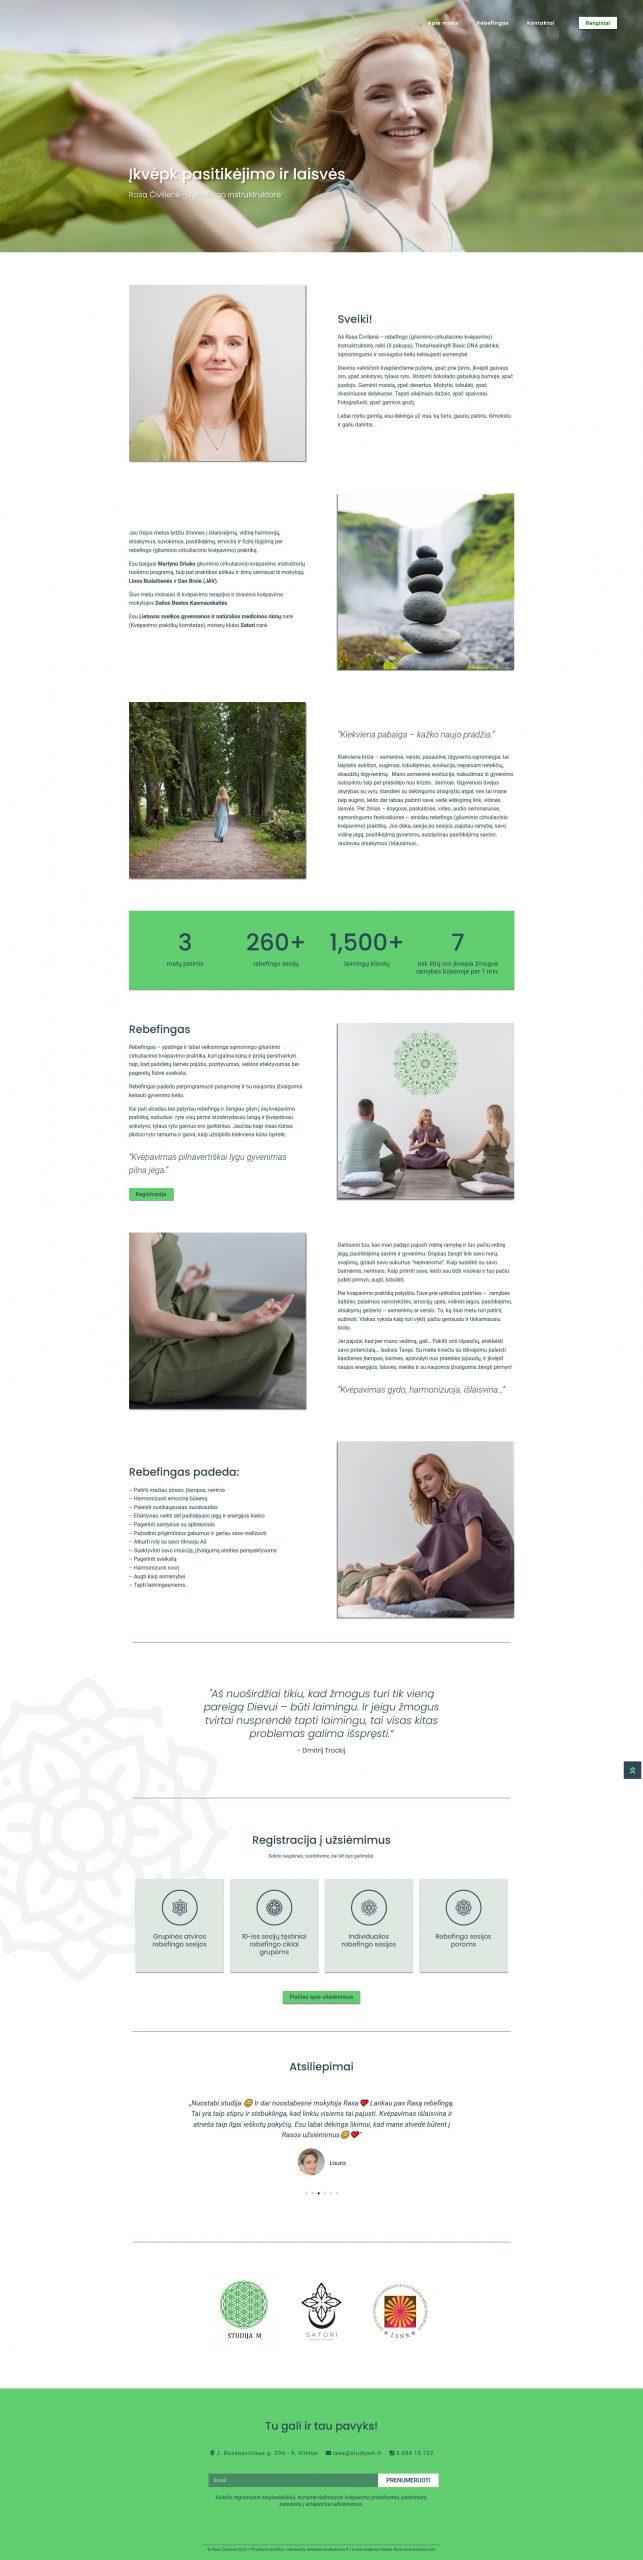 web dizainas 3